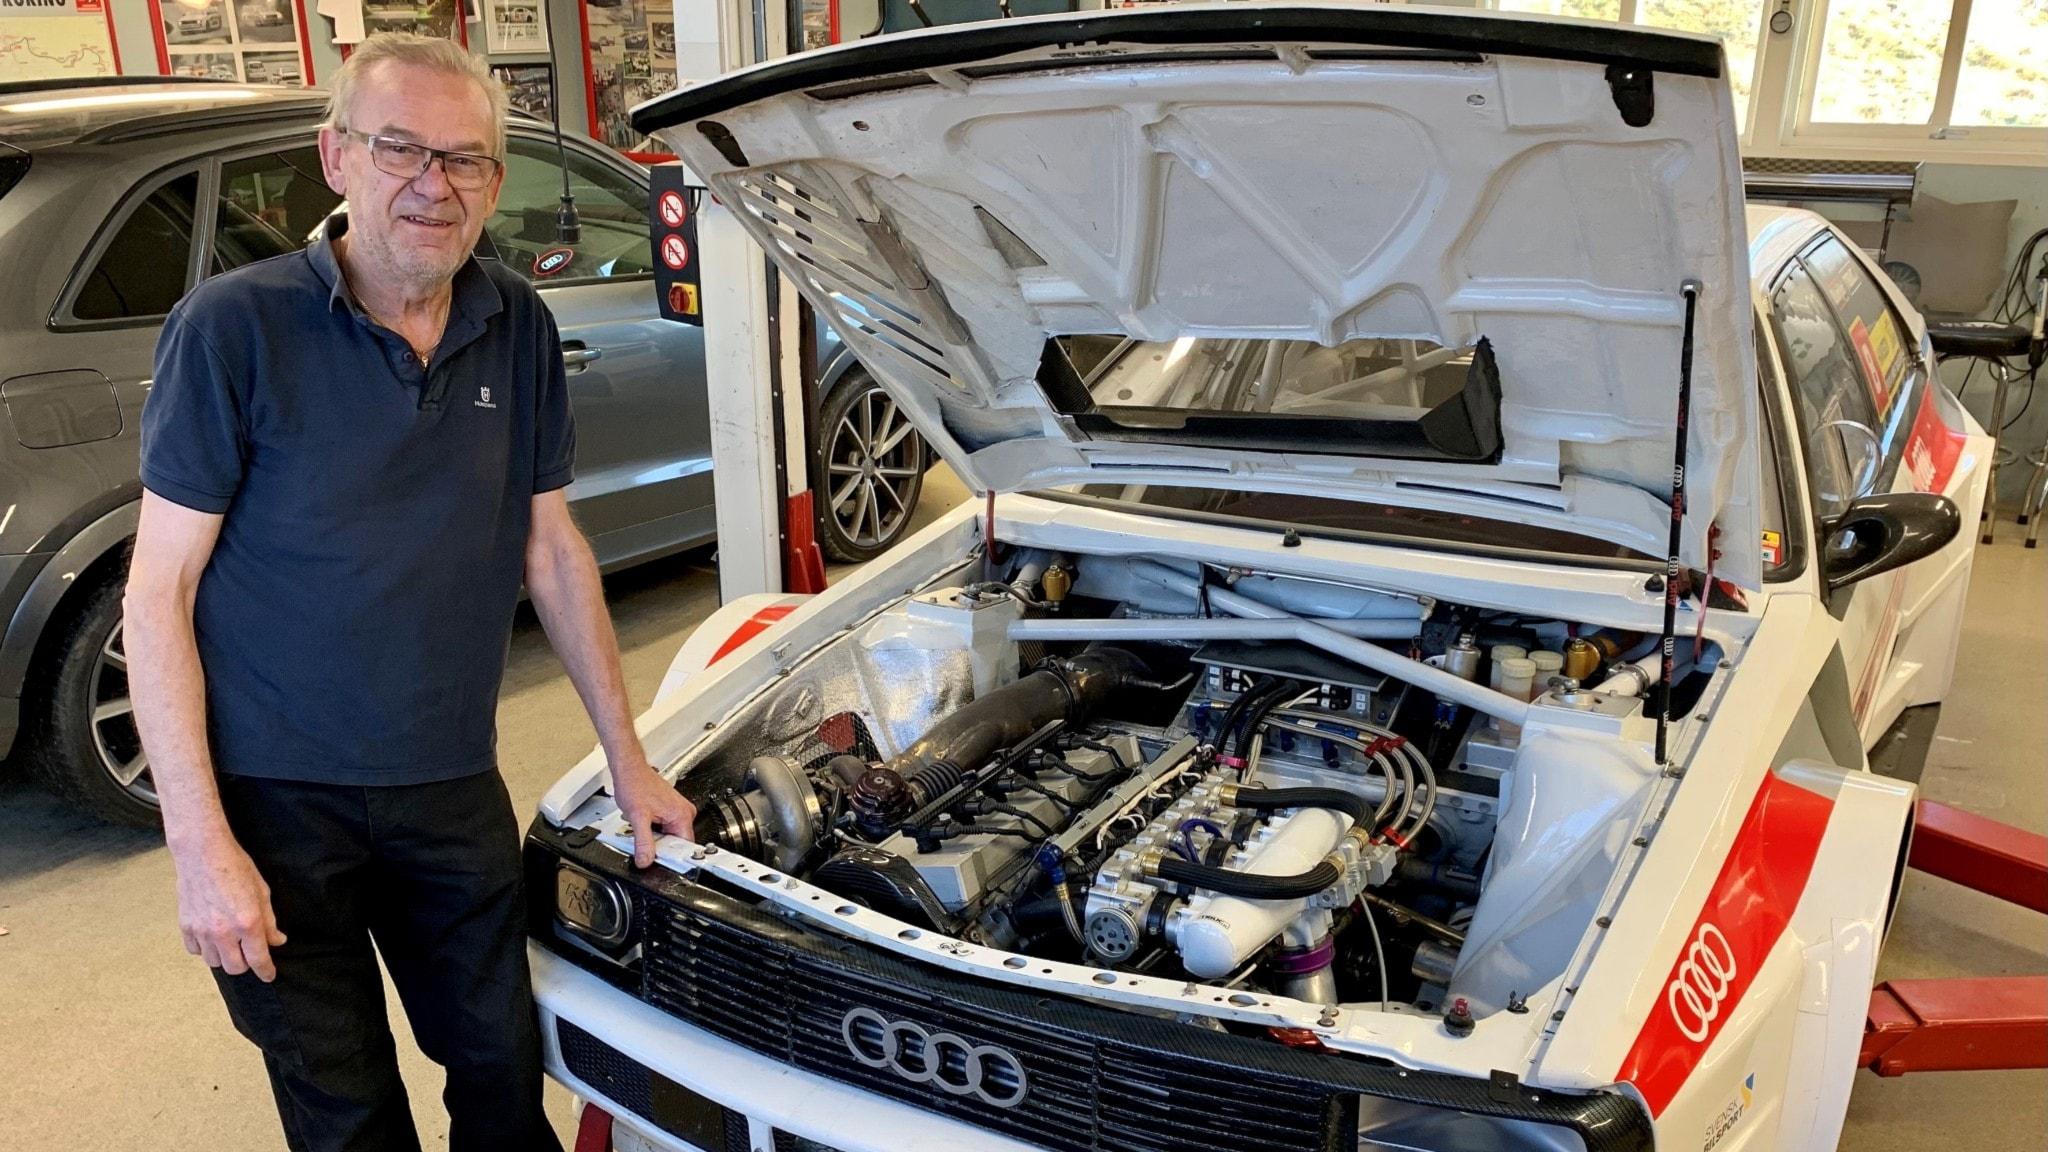 Bil i P4 om Audi. Ankungen som blev en premiumsvan!